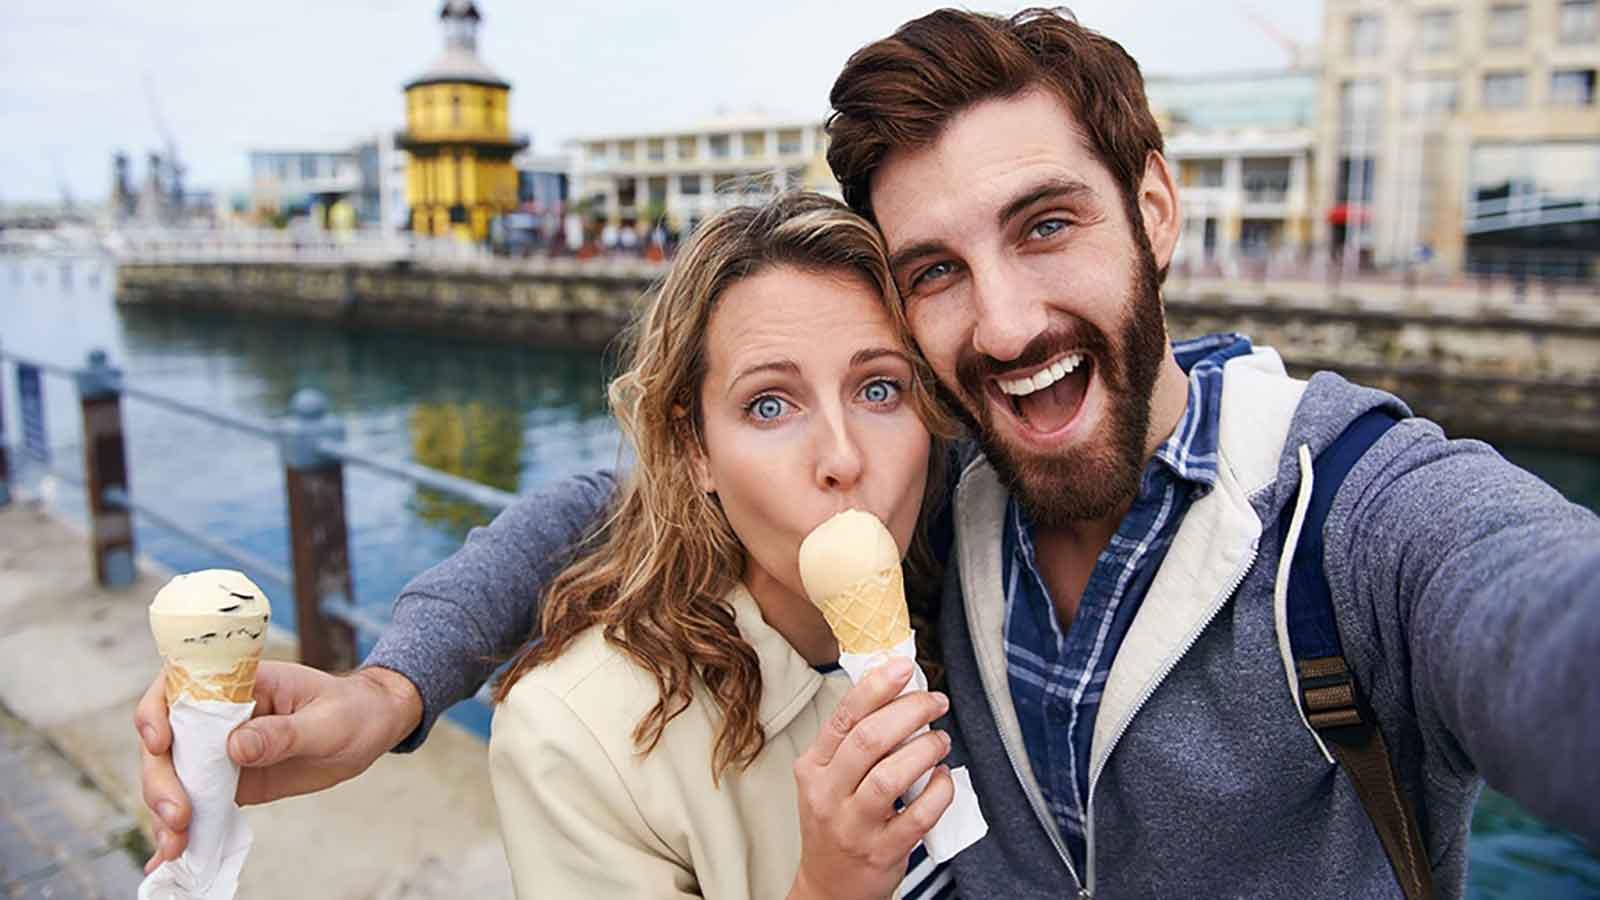 Ice Cream Van for Fundraising Events